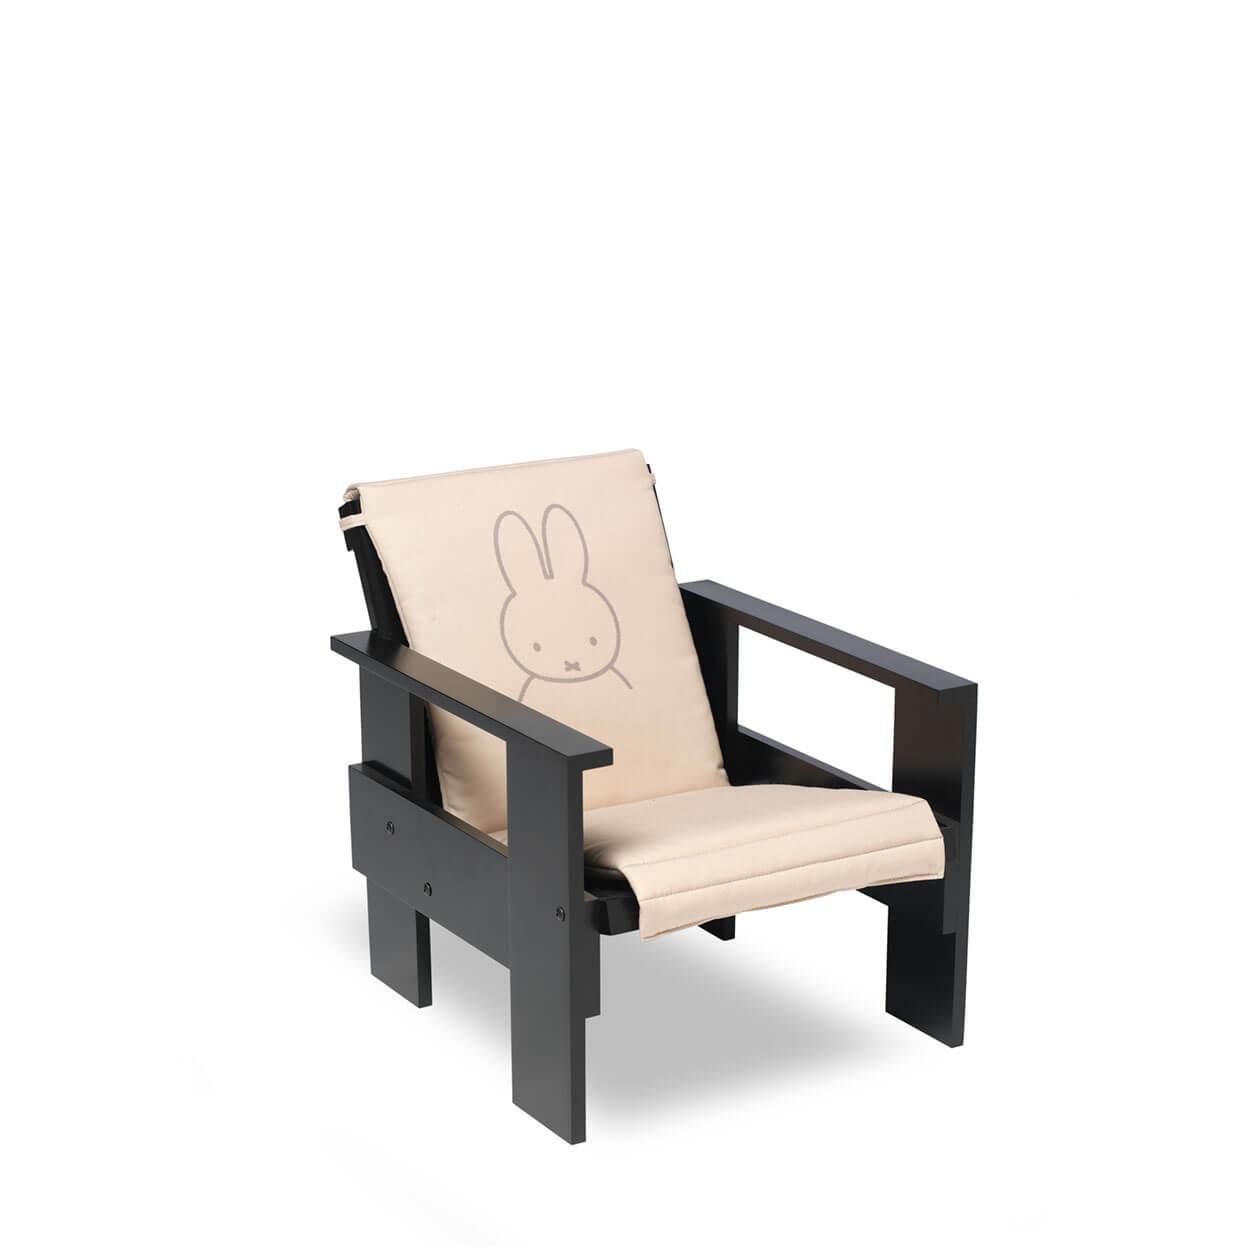 Sensational Junior Crate Chair Spectrum Design Download Free Architecture Designs Scobabritishbridgeorg